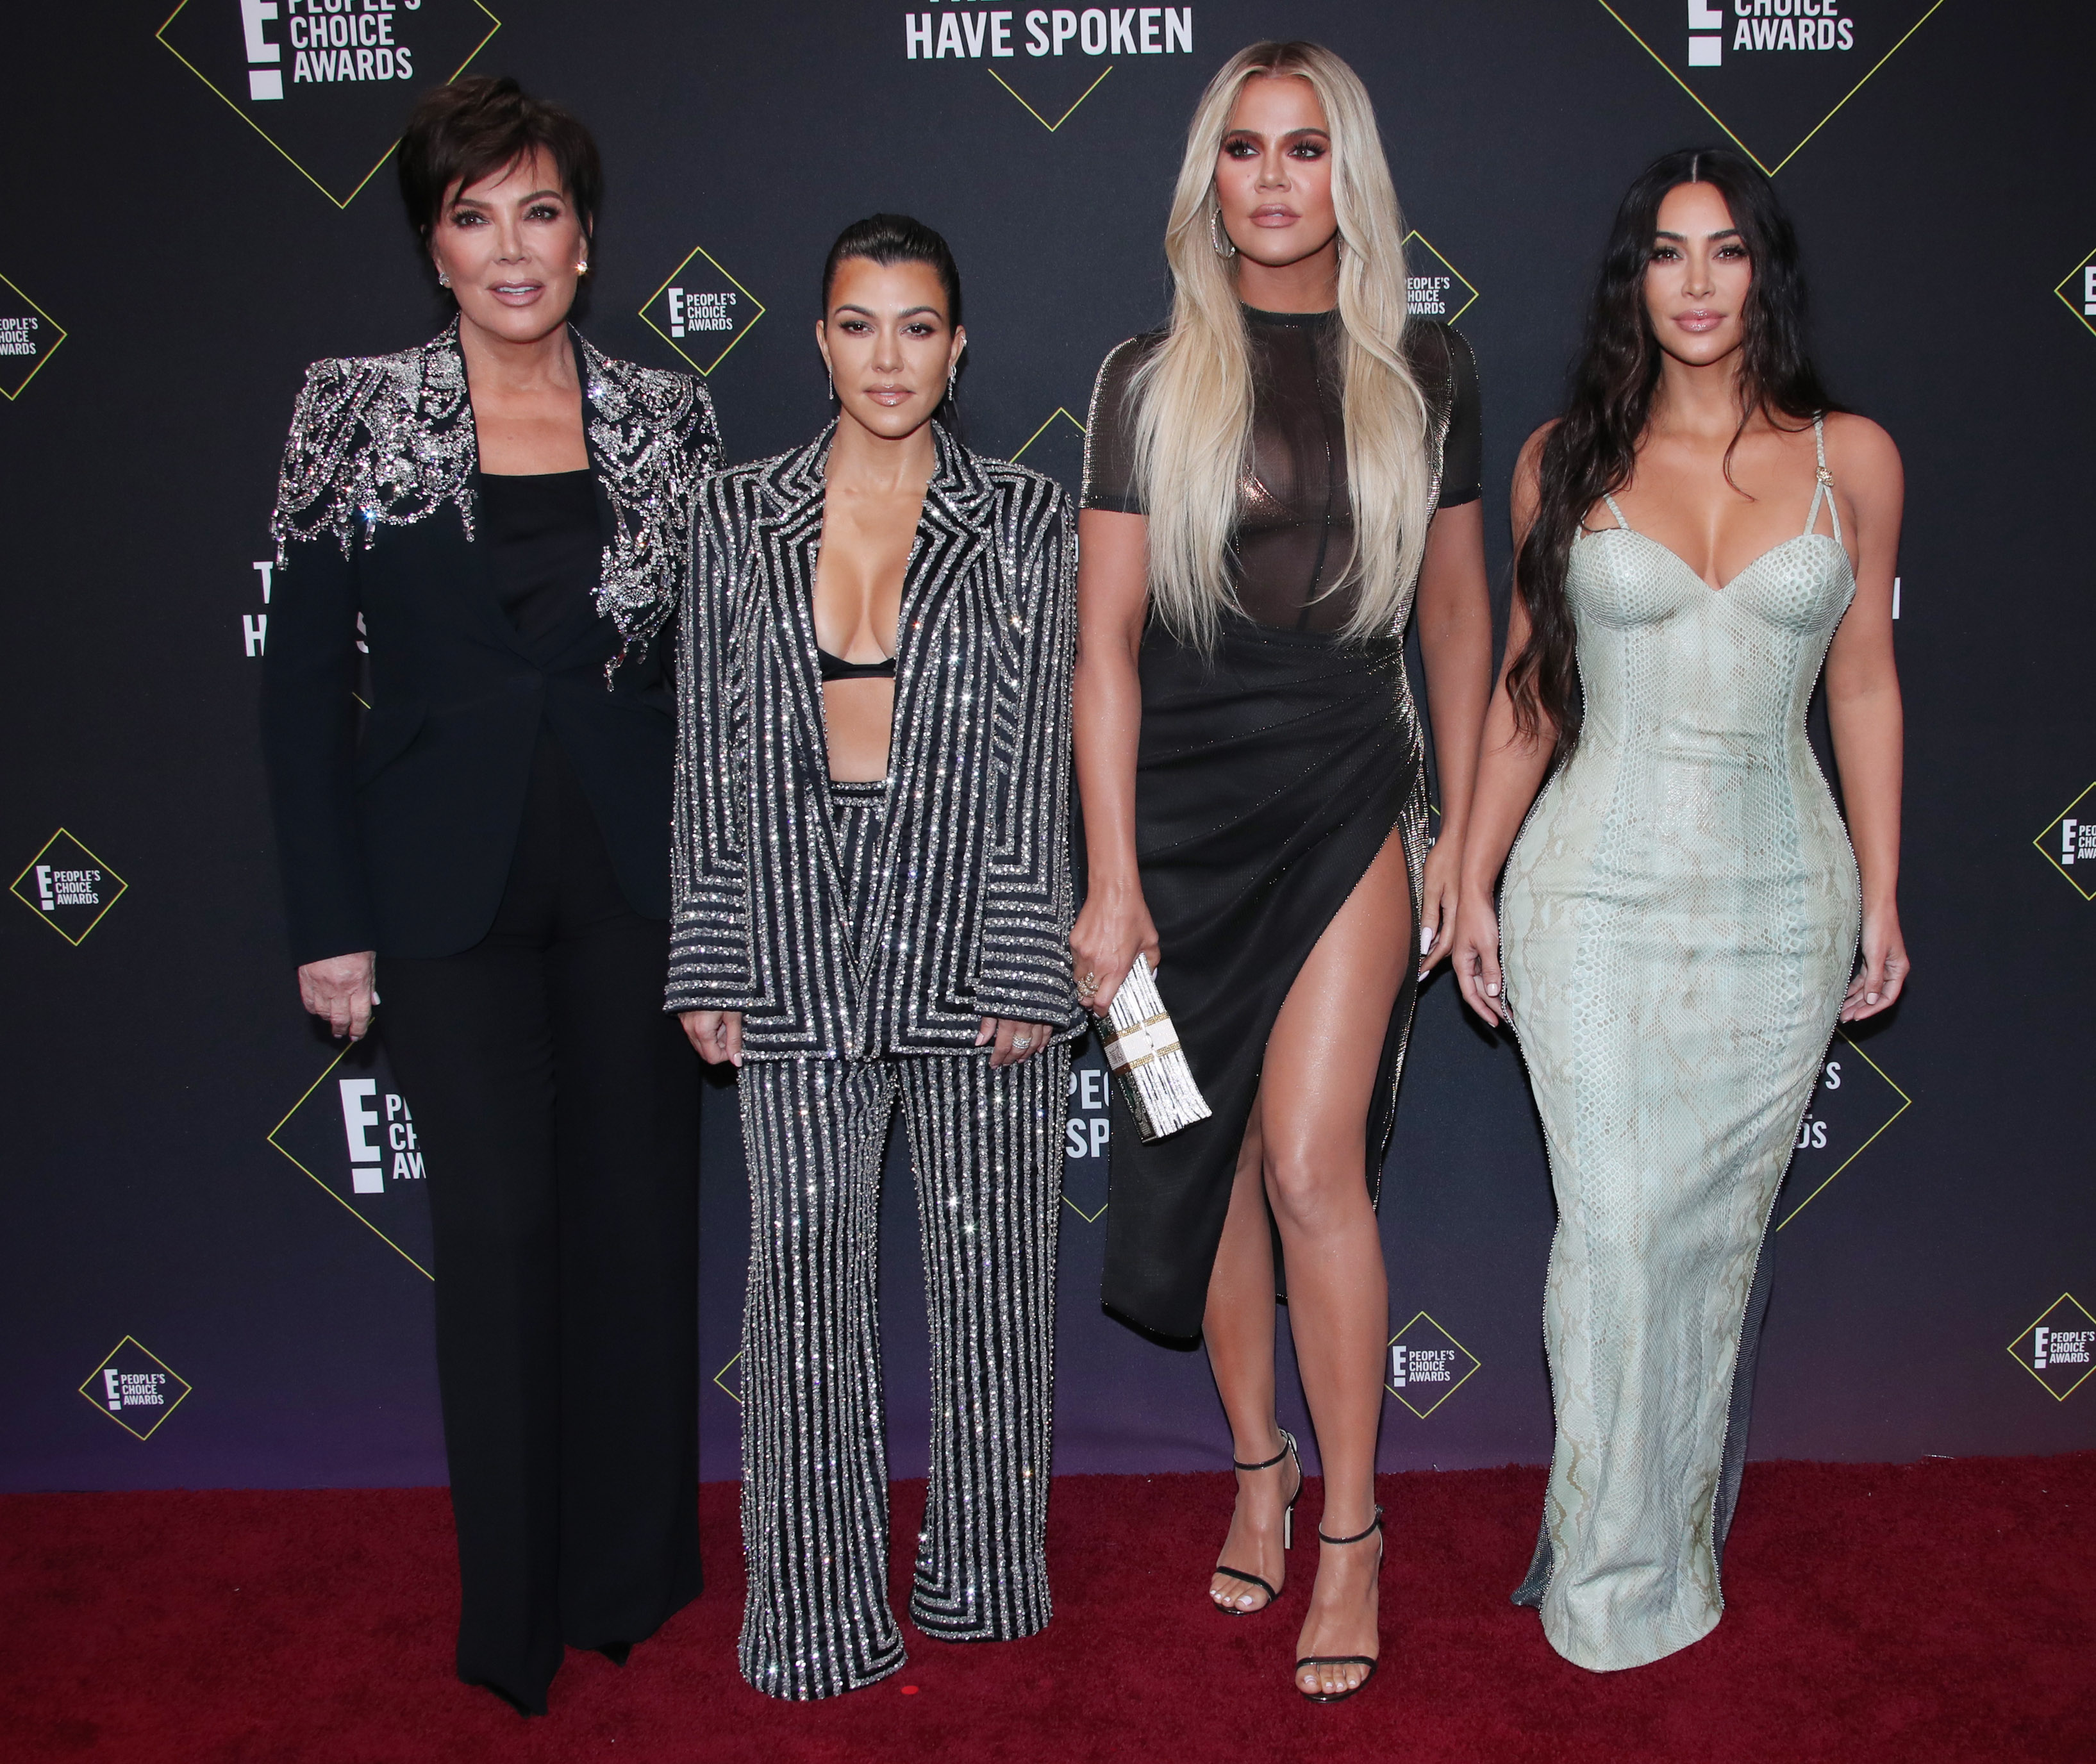 Kris Jenner, Kourtney Kardashian, Khloe Kardashian, Kim Kardashian West